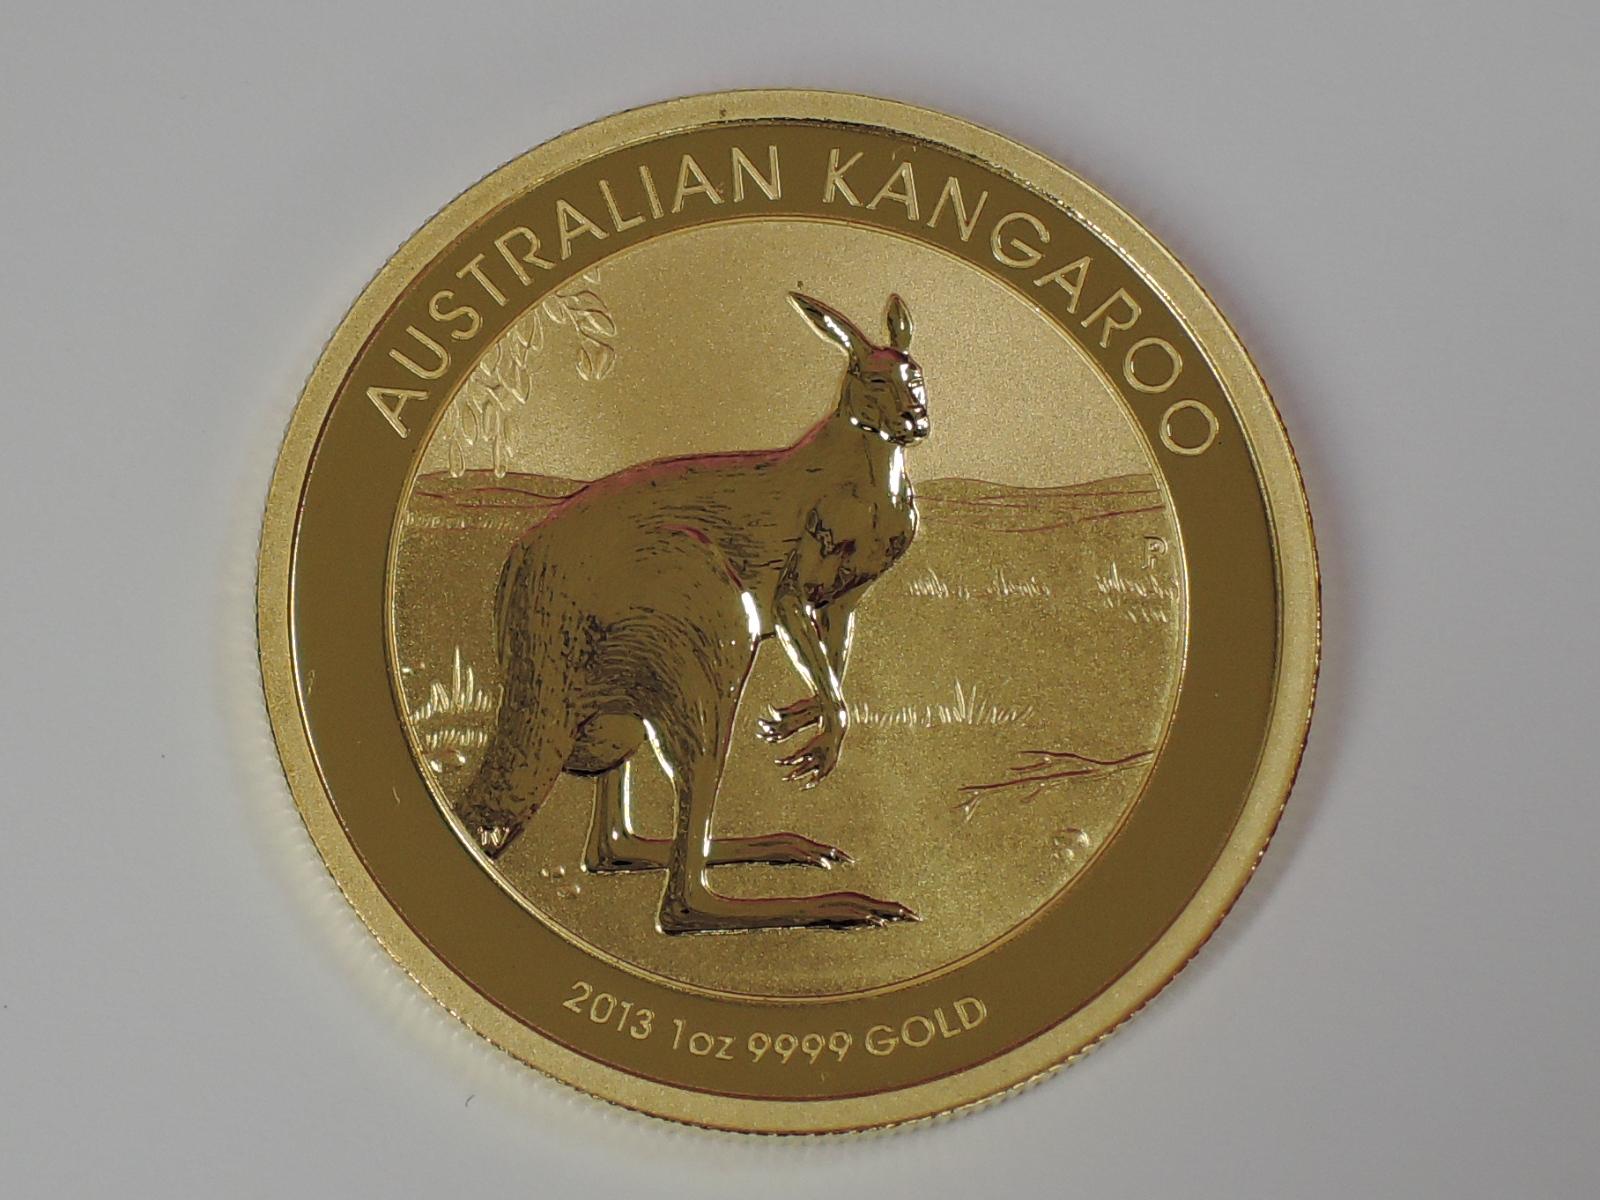 Lot 606 - A gold 1oz 2013 100 dollar Australian Kangaroo coin, in plastic case